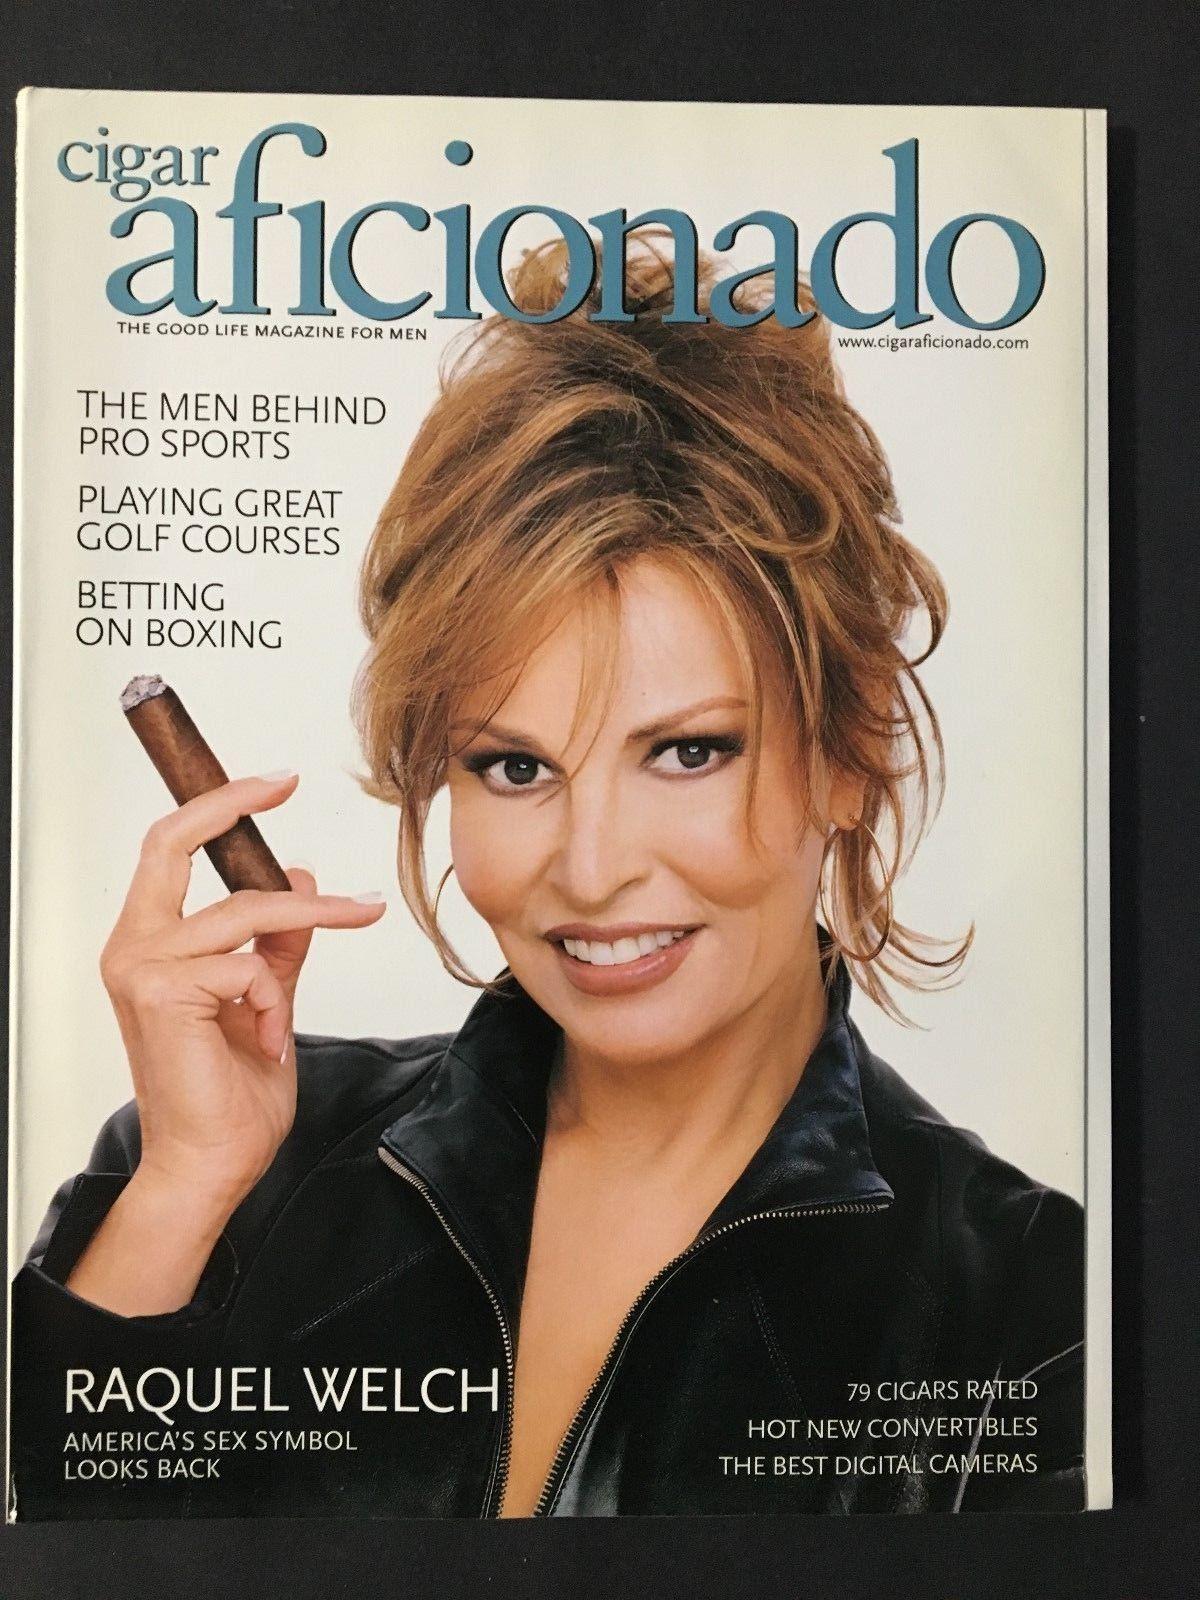 cigar-aficionado-magazine-august-2001-raquel-welch.jpg